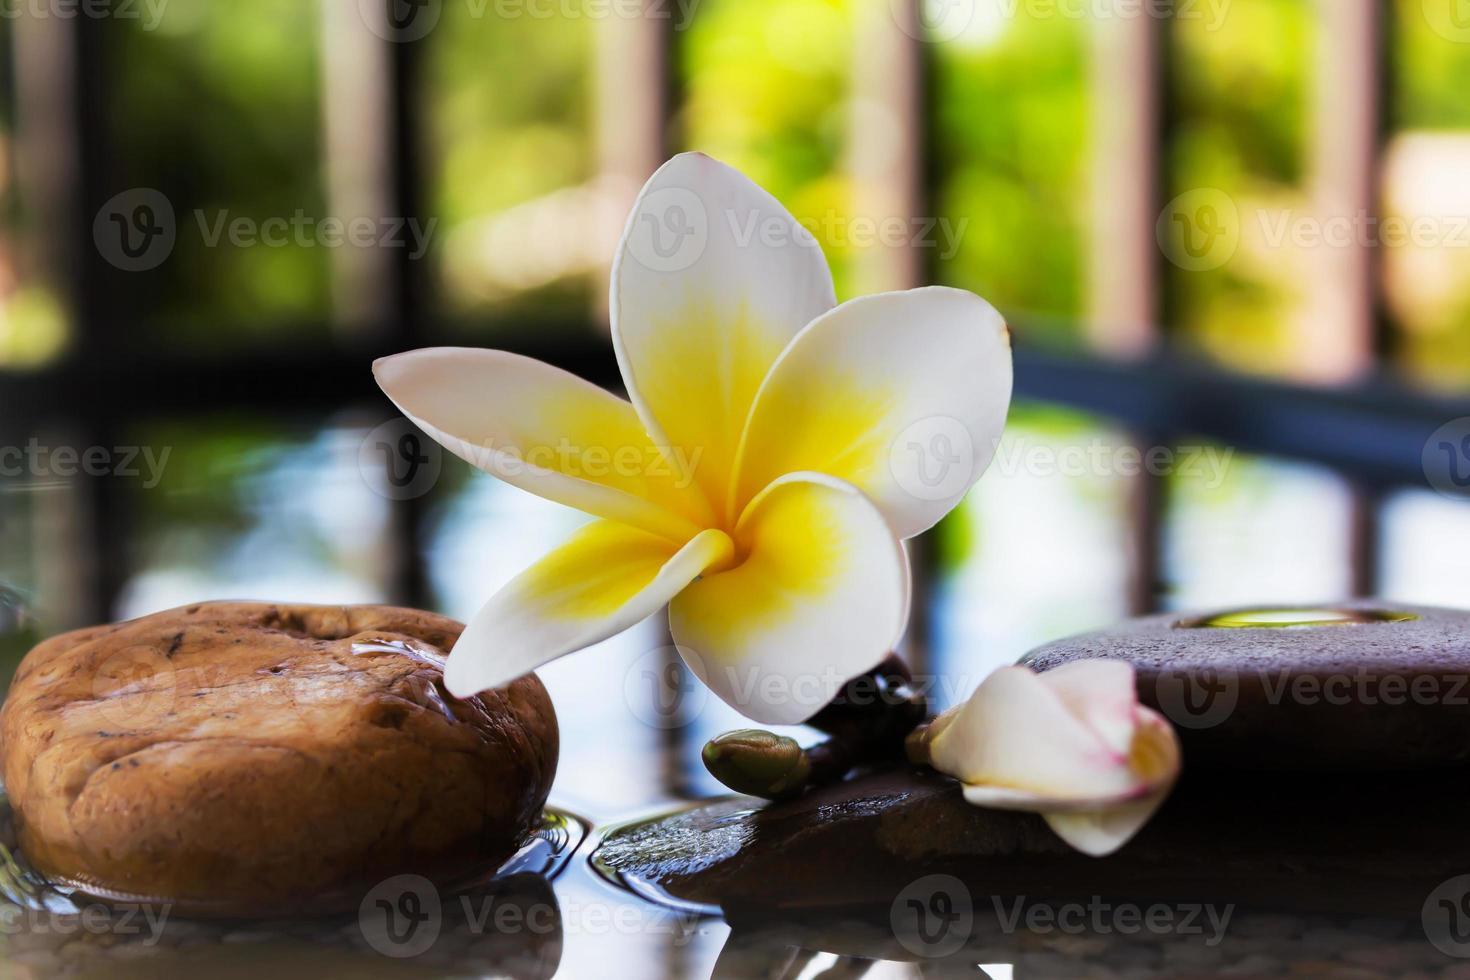 plumeria of frangipani versierd op water en kiezelsteen foto